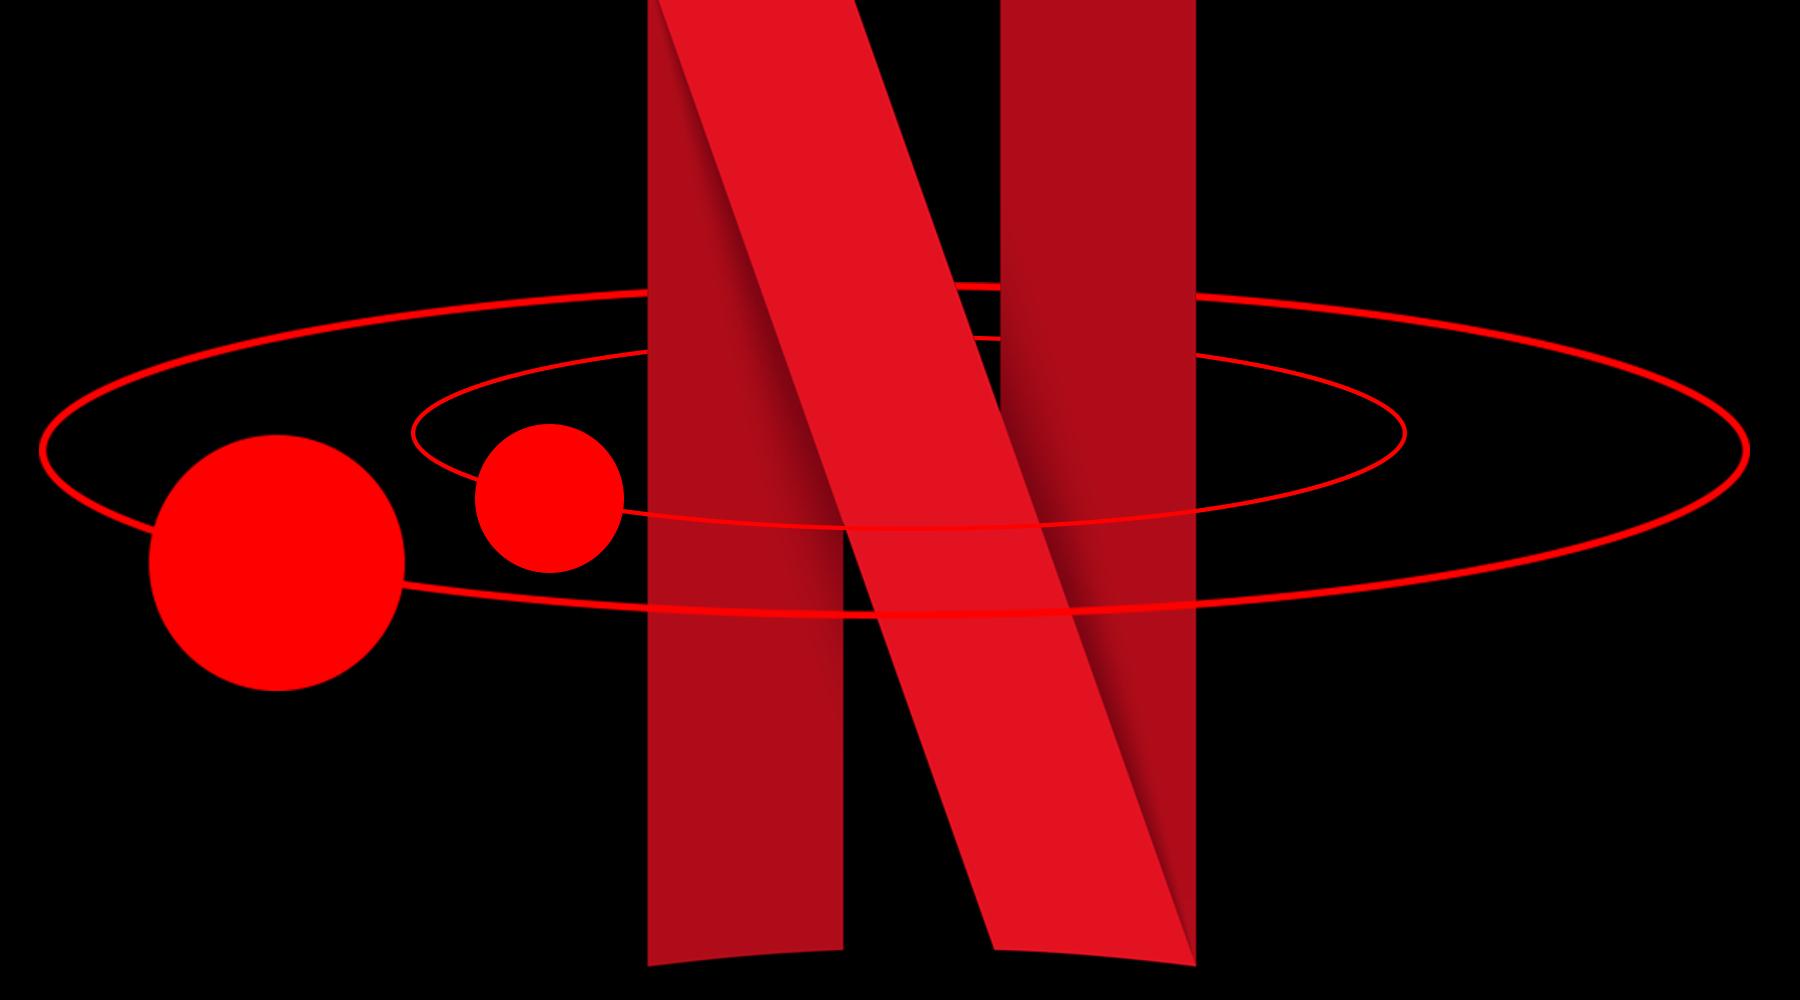 Un algoritmo similar a Netflix busca estrellas cercanas para encontrar mundos ocultos.